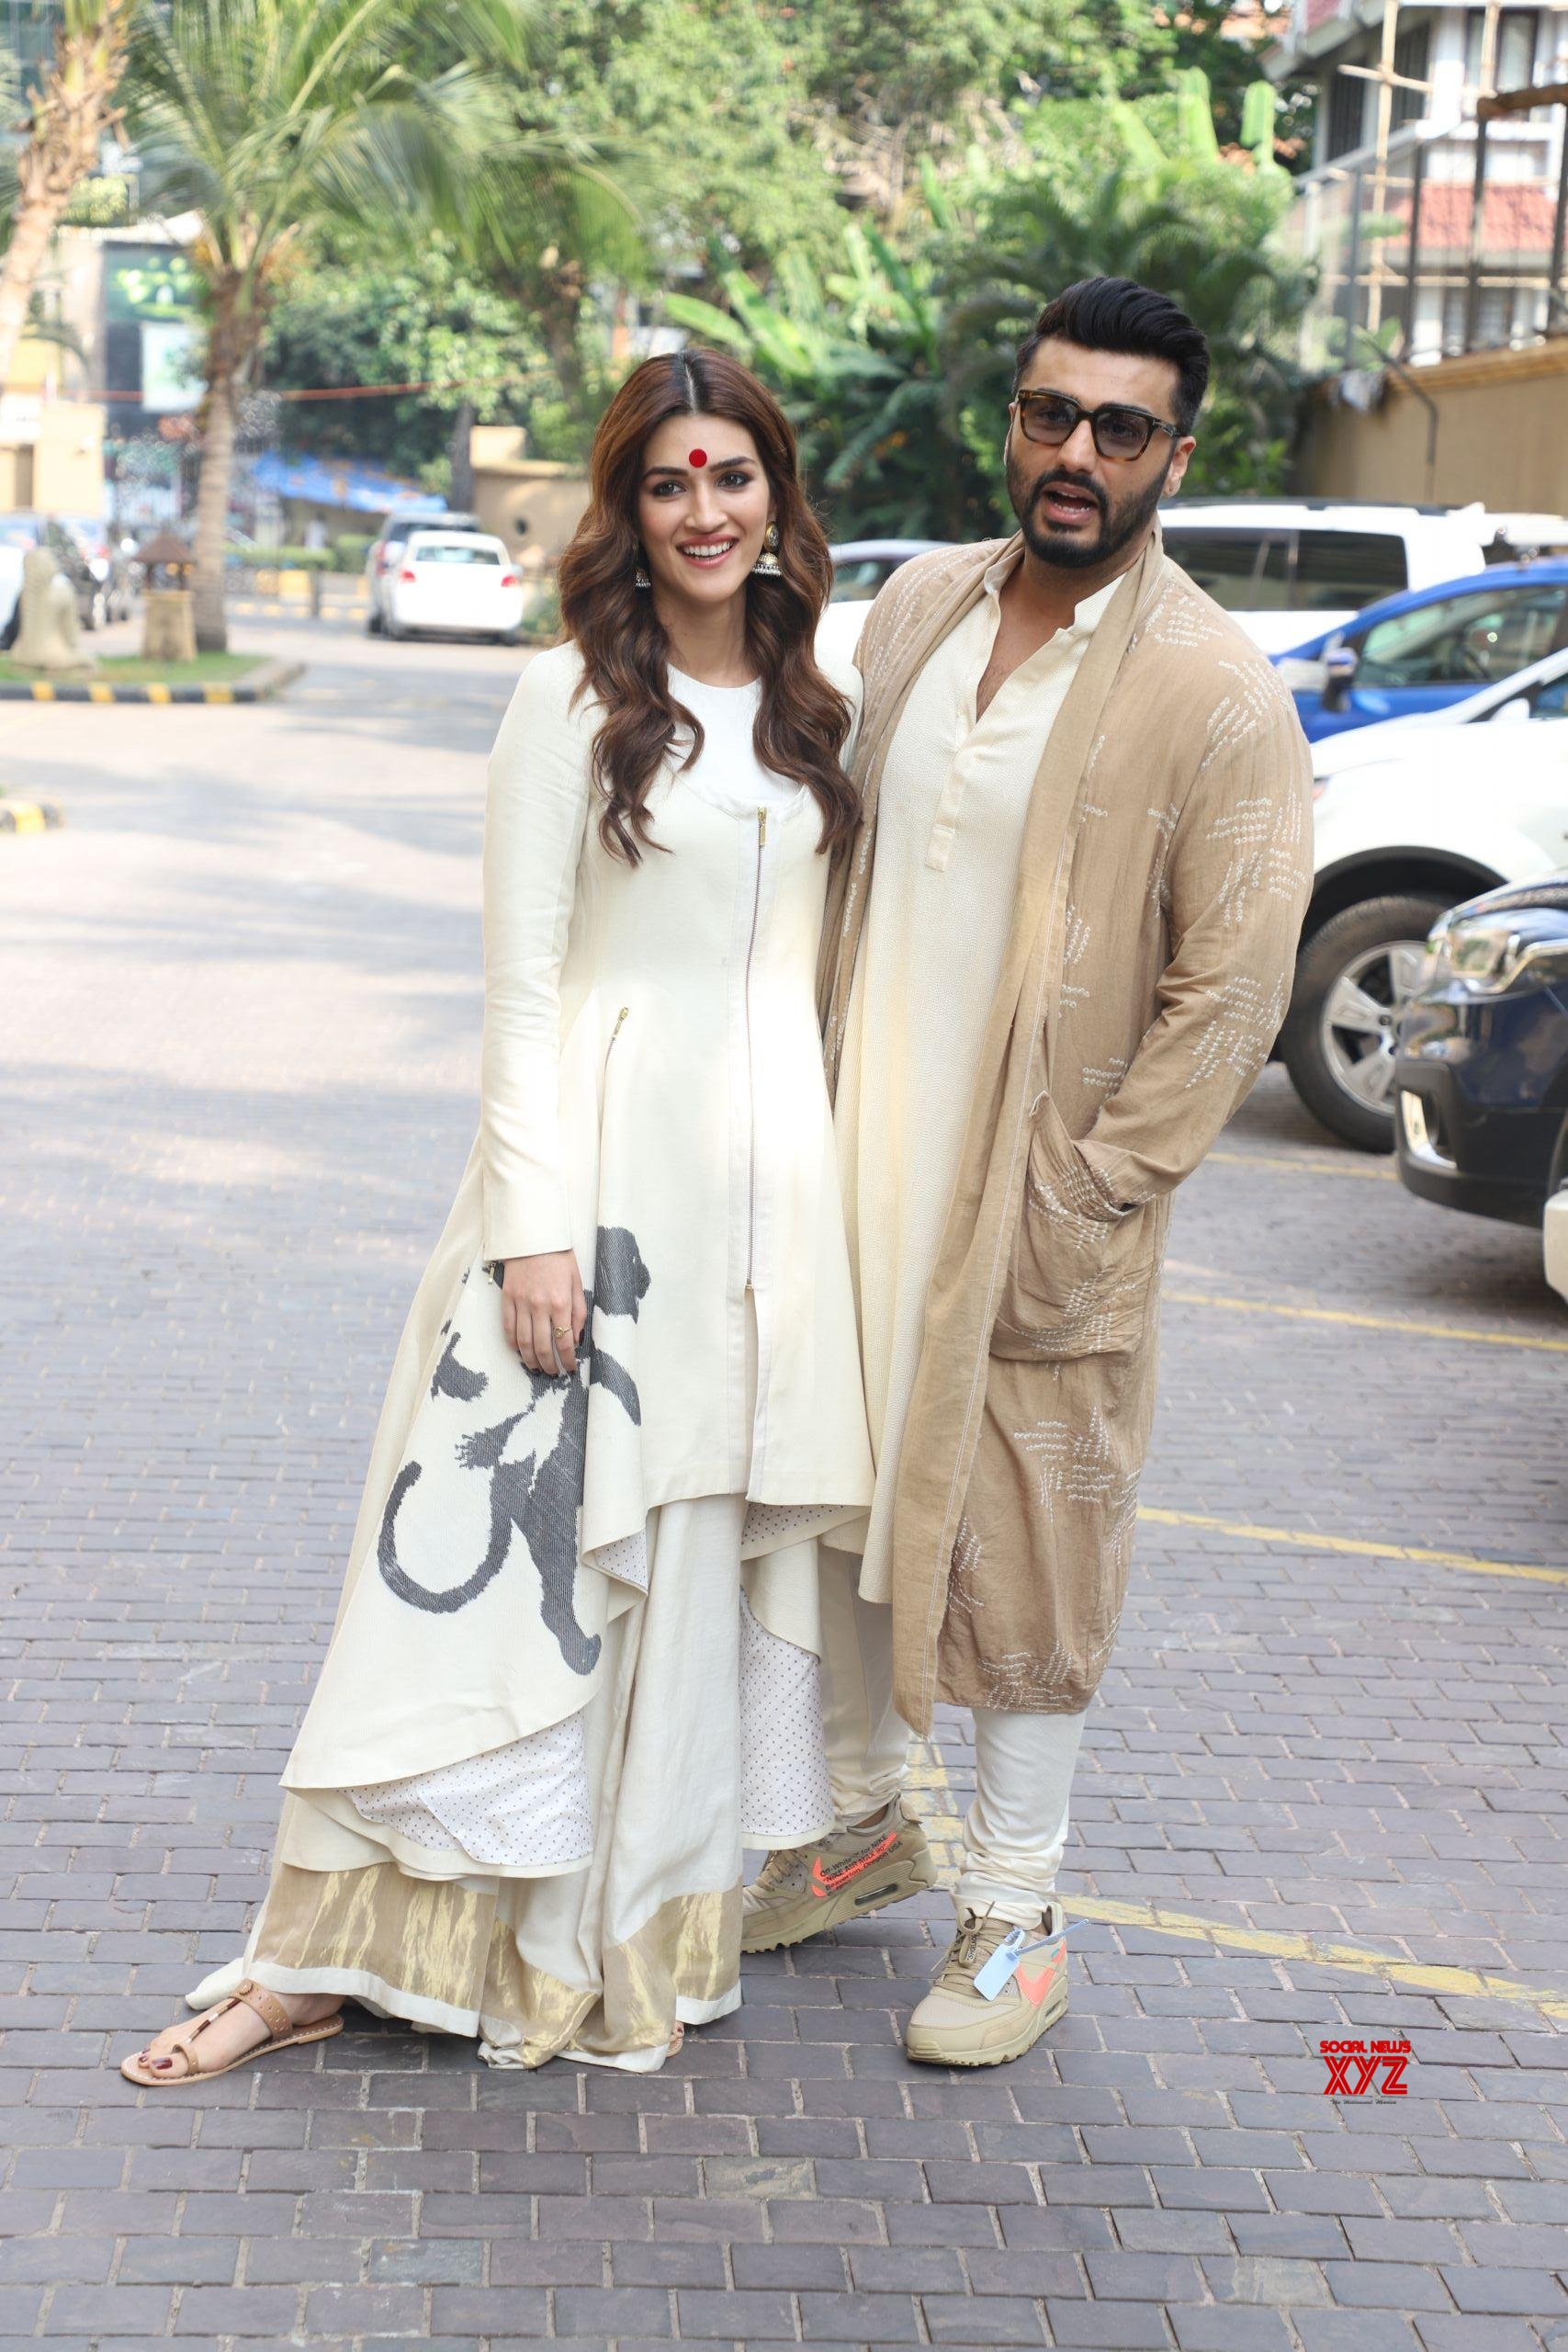 Arjun Kapoor And Kriti Sanon Spotted Promoting Their Film Panipat At JW Marriott In Juhu HD Gallery